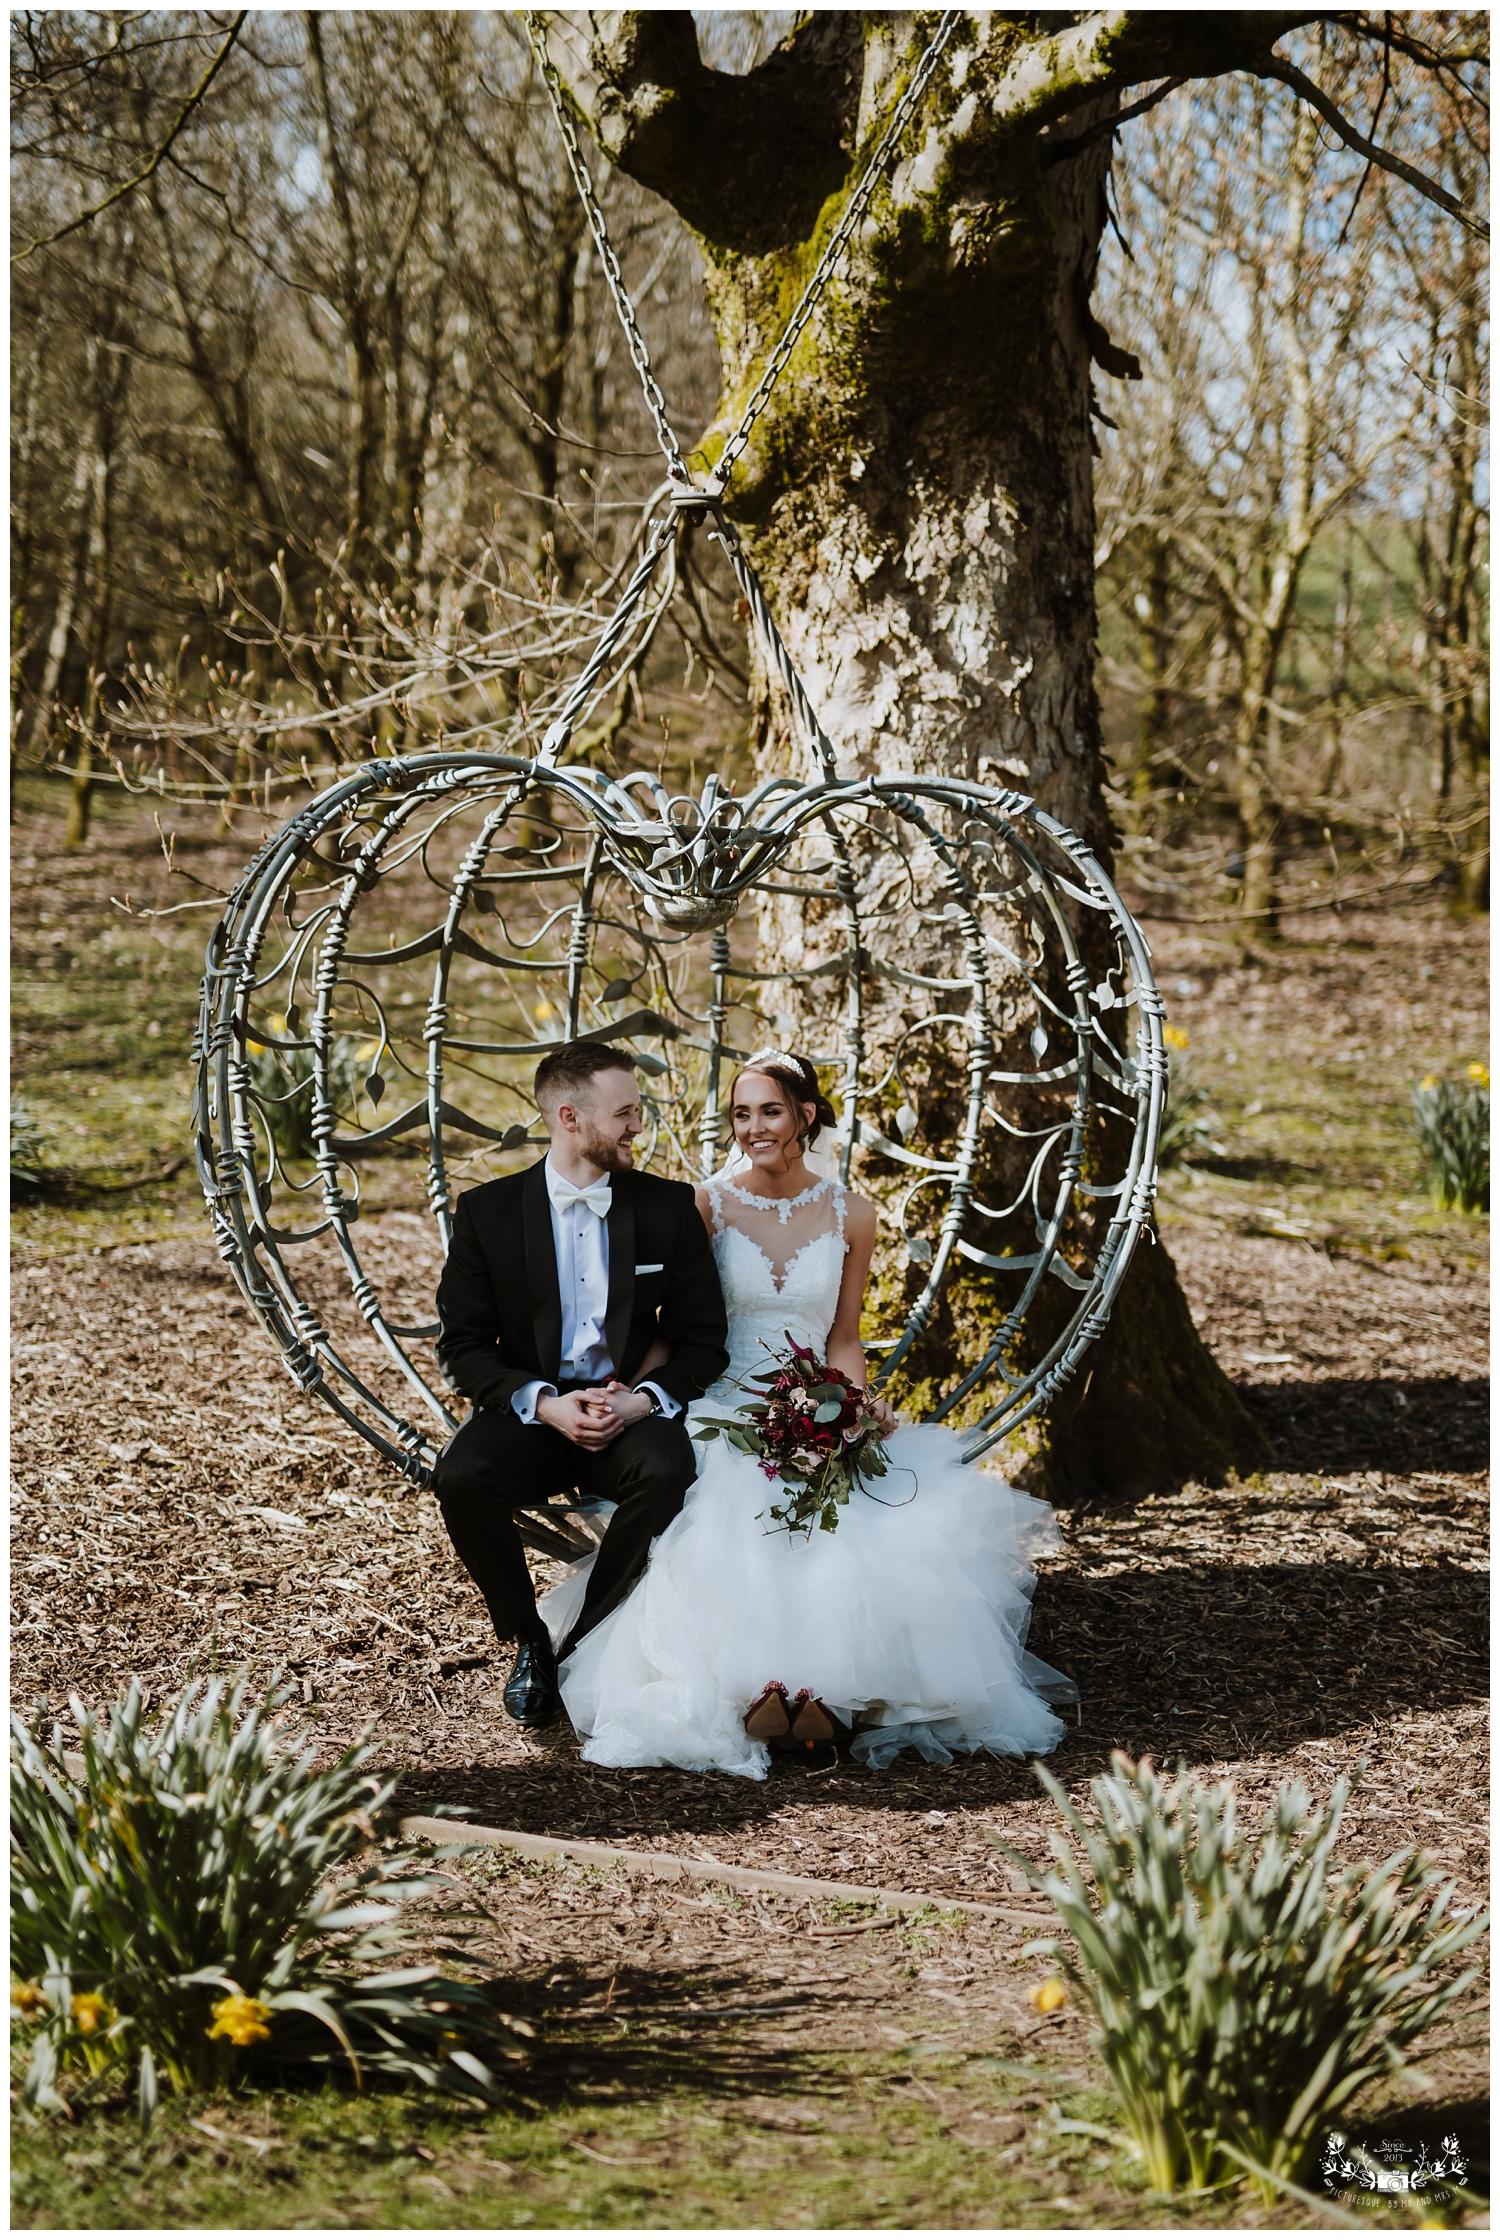 Glenskirlie House, Wedding Photography, Scotland_0028.jpg